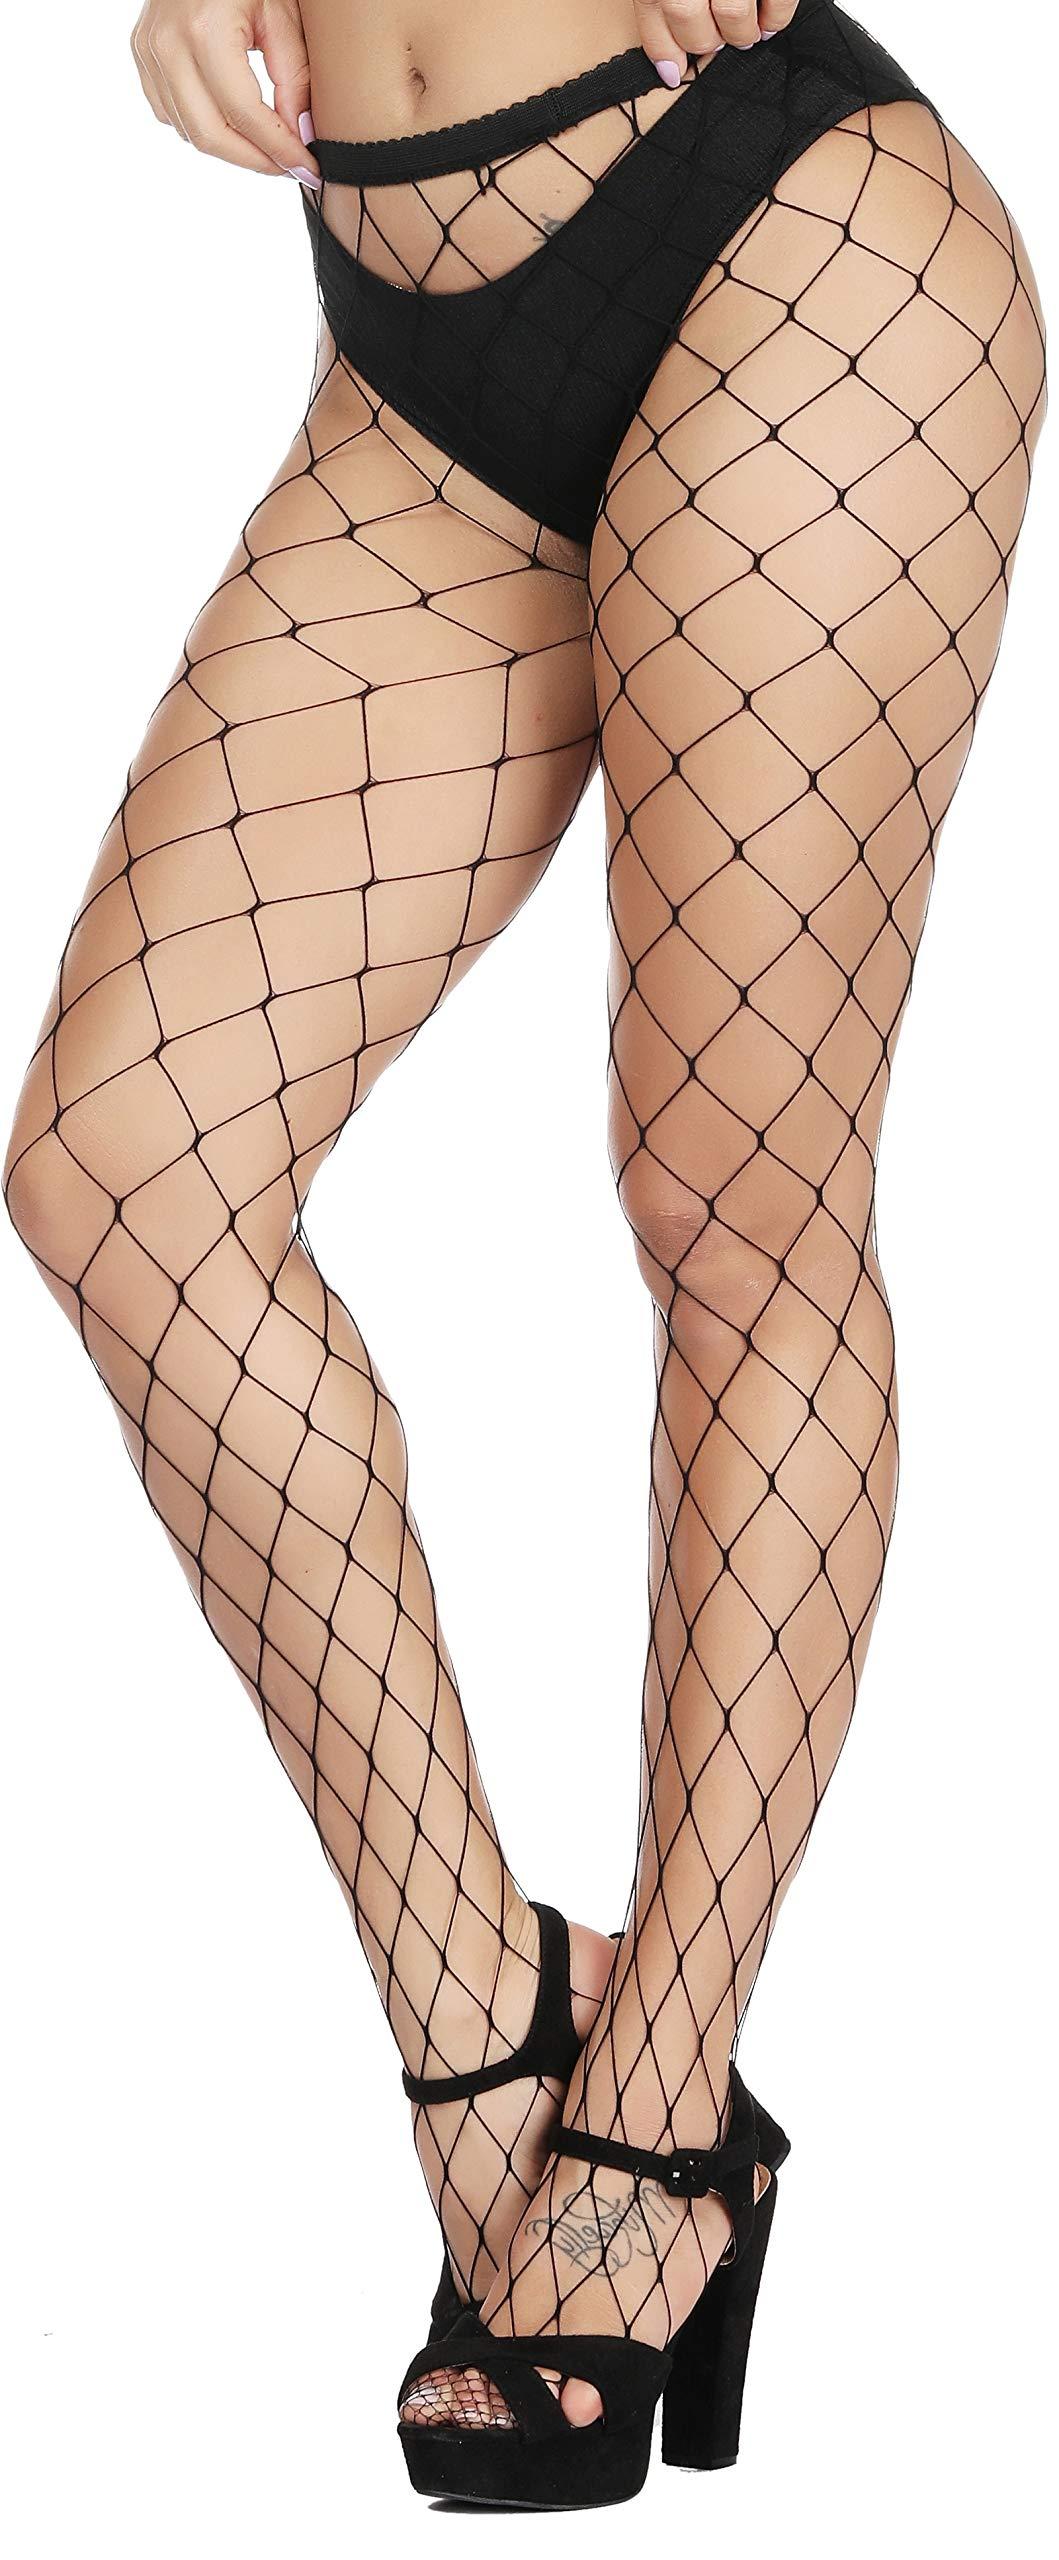 HZH Womens High Waist Tights Fishnet Stockings Thigh High Stocking Pantyhose